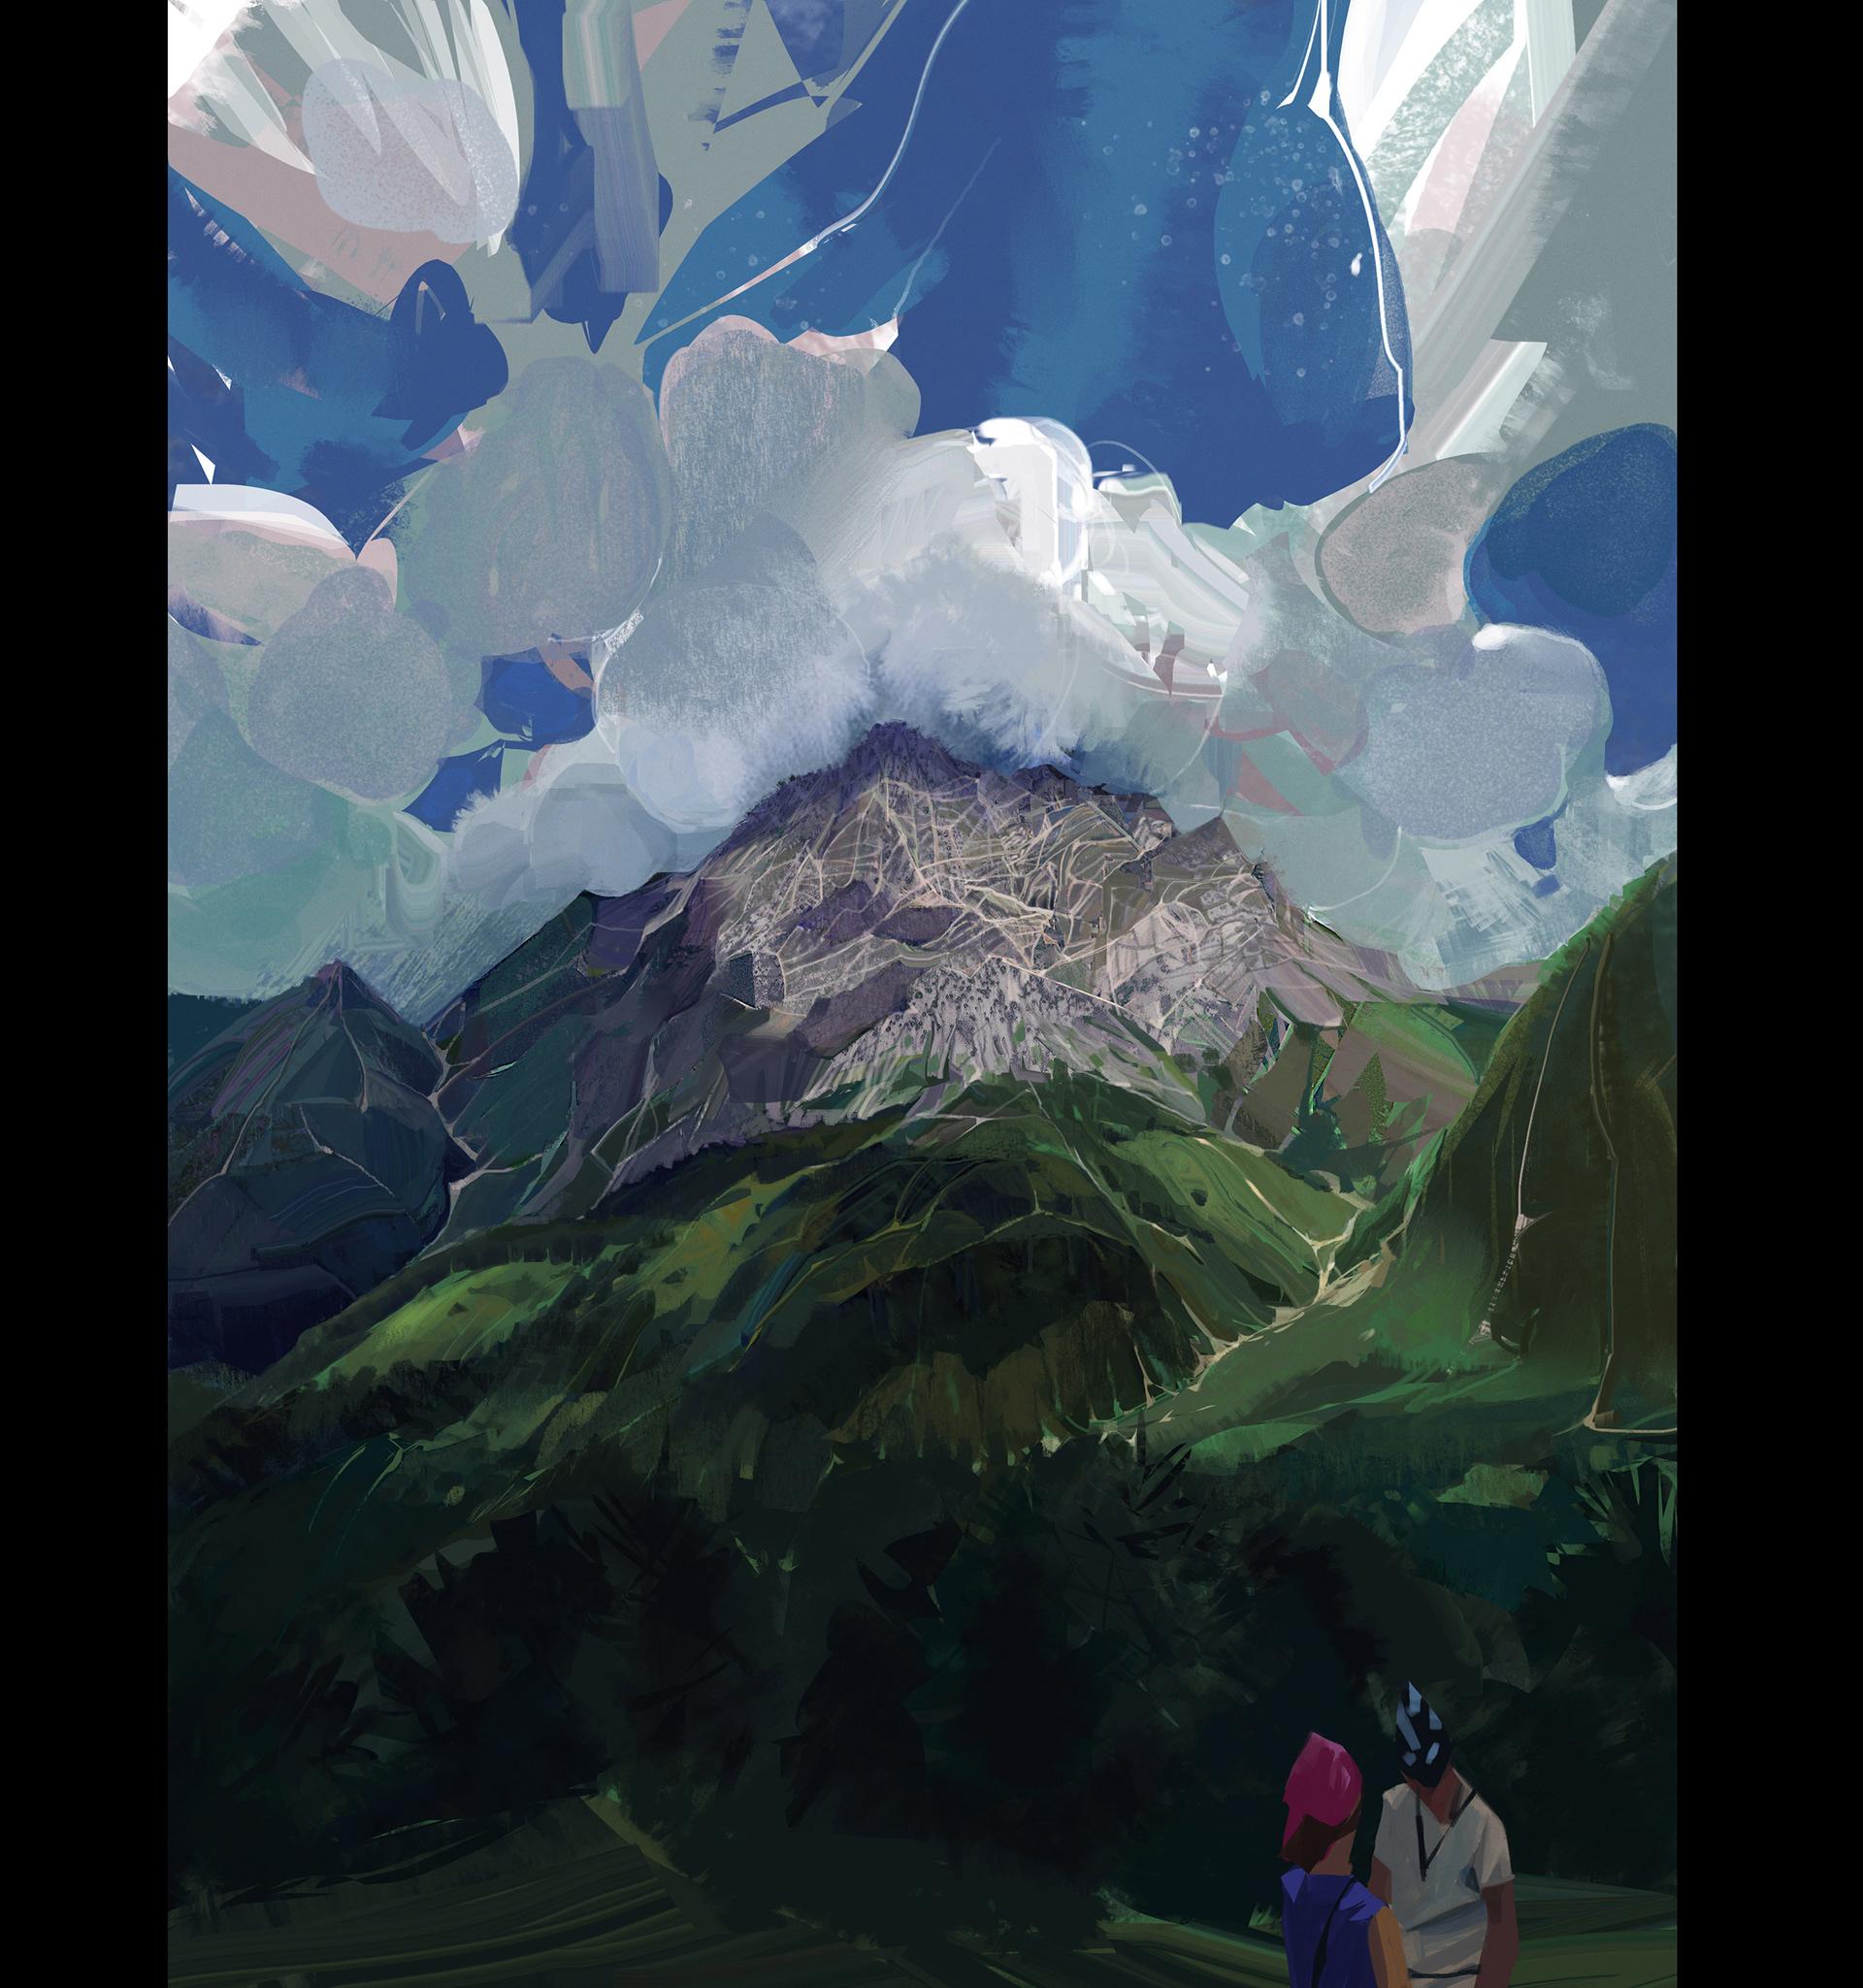 The Georgia Paintings by Rinat Khabirov